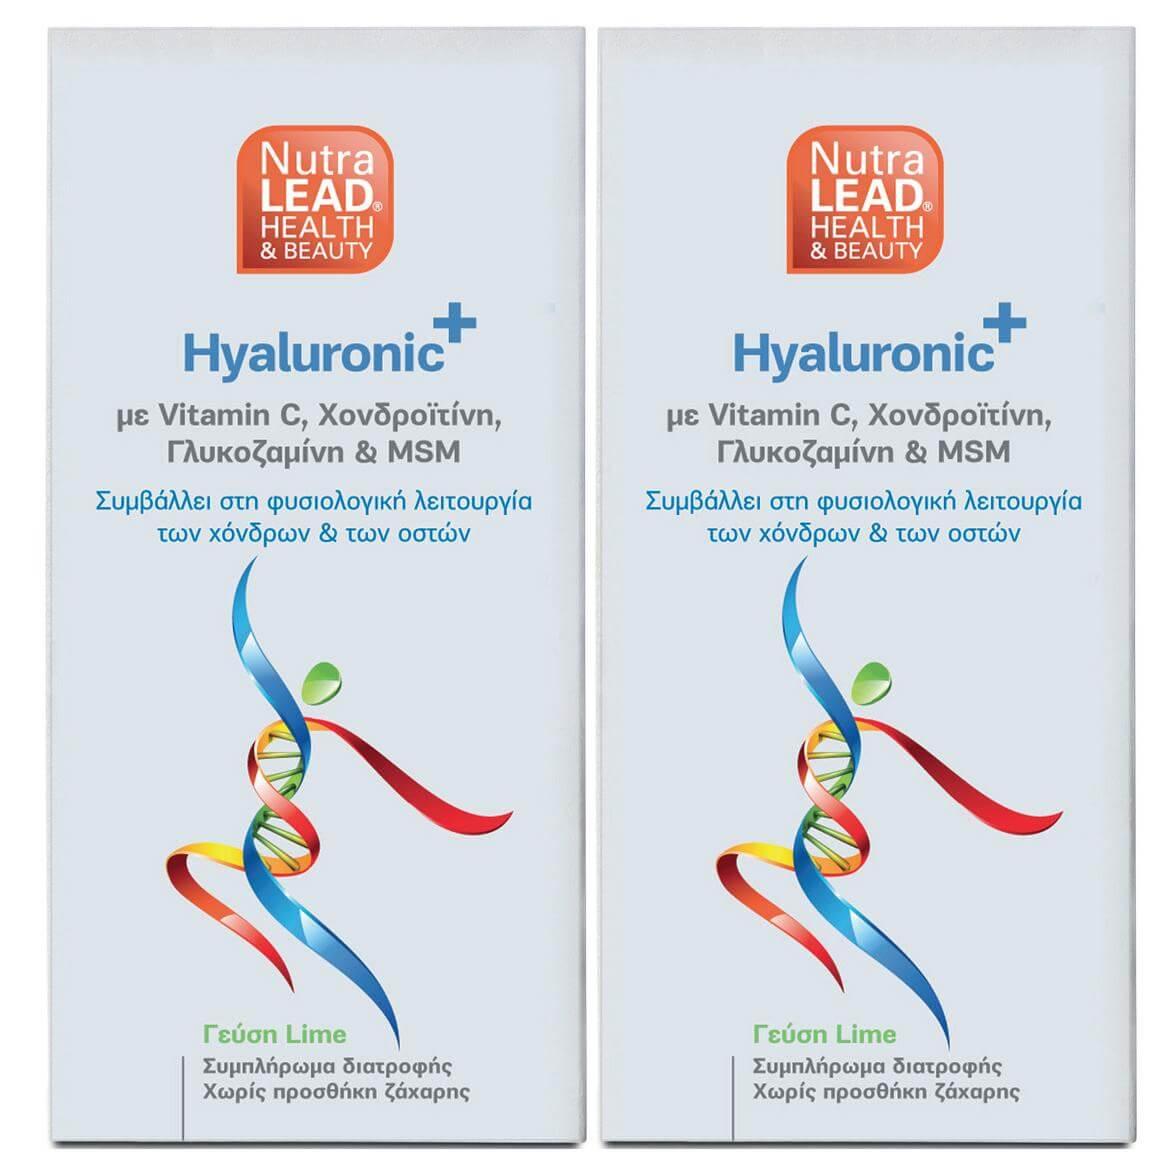 Nutralead Hyaluronic Plus Υαλουρονικό οξύ με Βιταμίνη C Χονδροϊτίνη Γλυκοζαμίνη & MSM 1+1 ΔΩΡΟ 2x50ml